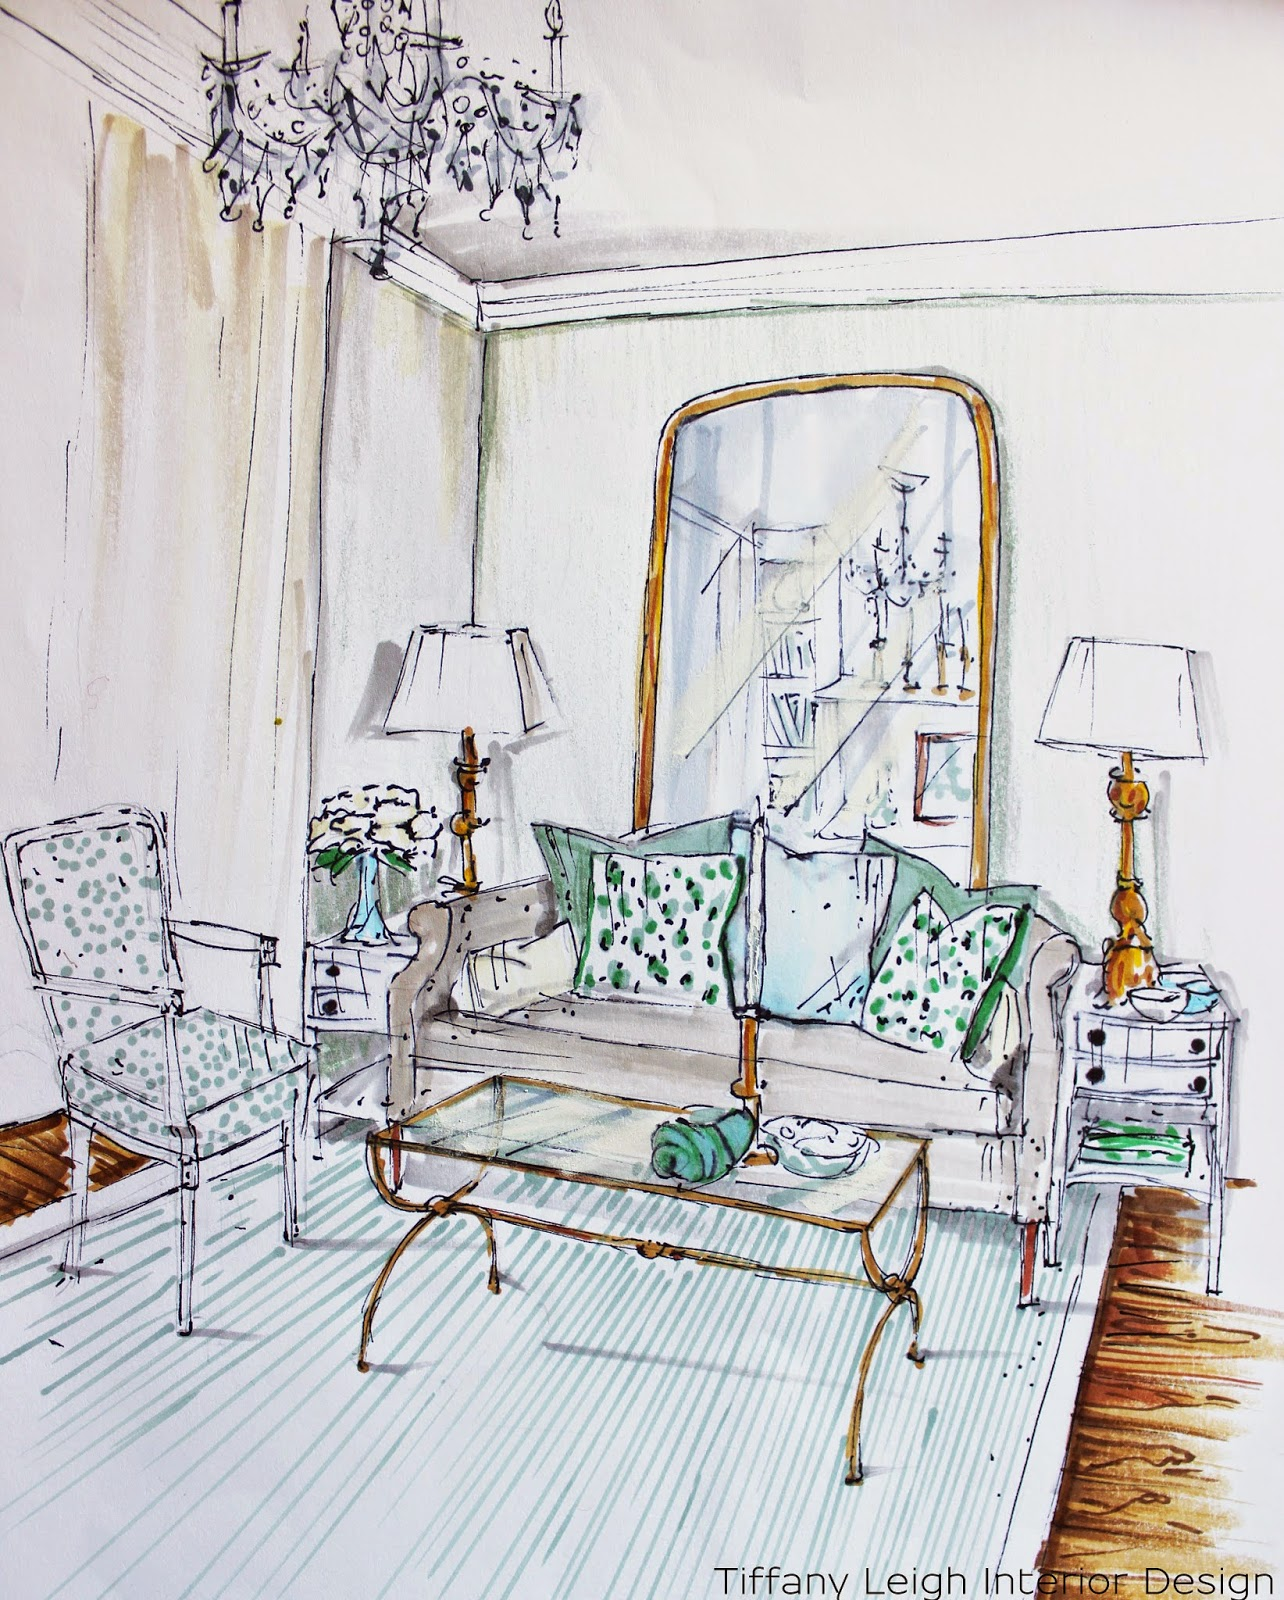 Interior Design Sketch: Tiffany Leigh Interior Design: In My Sketchbook: Living